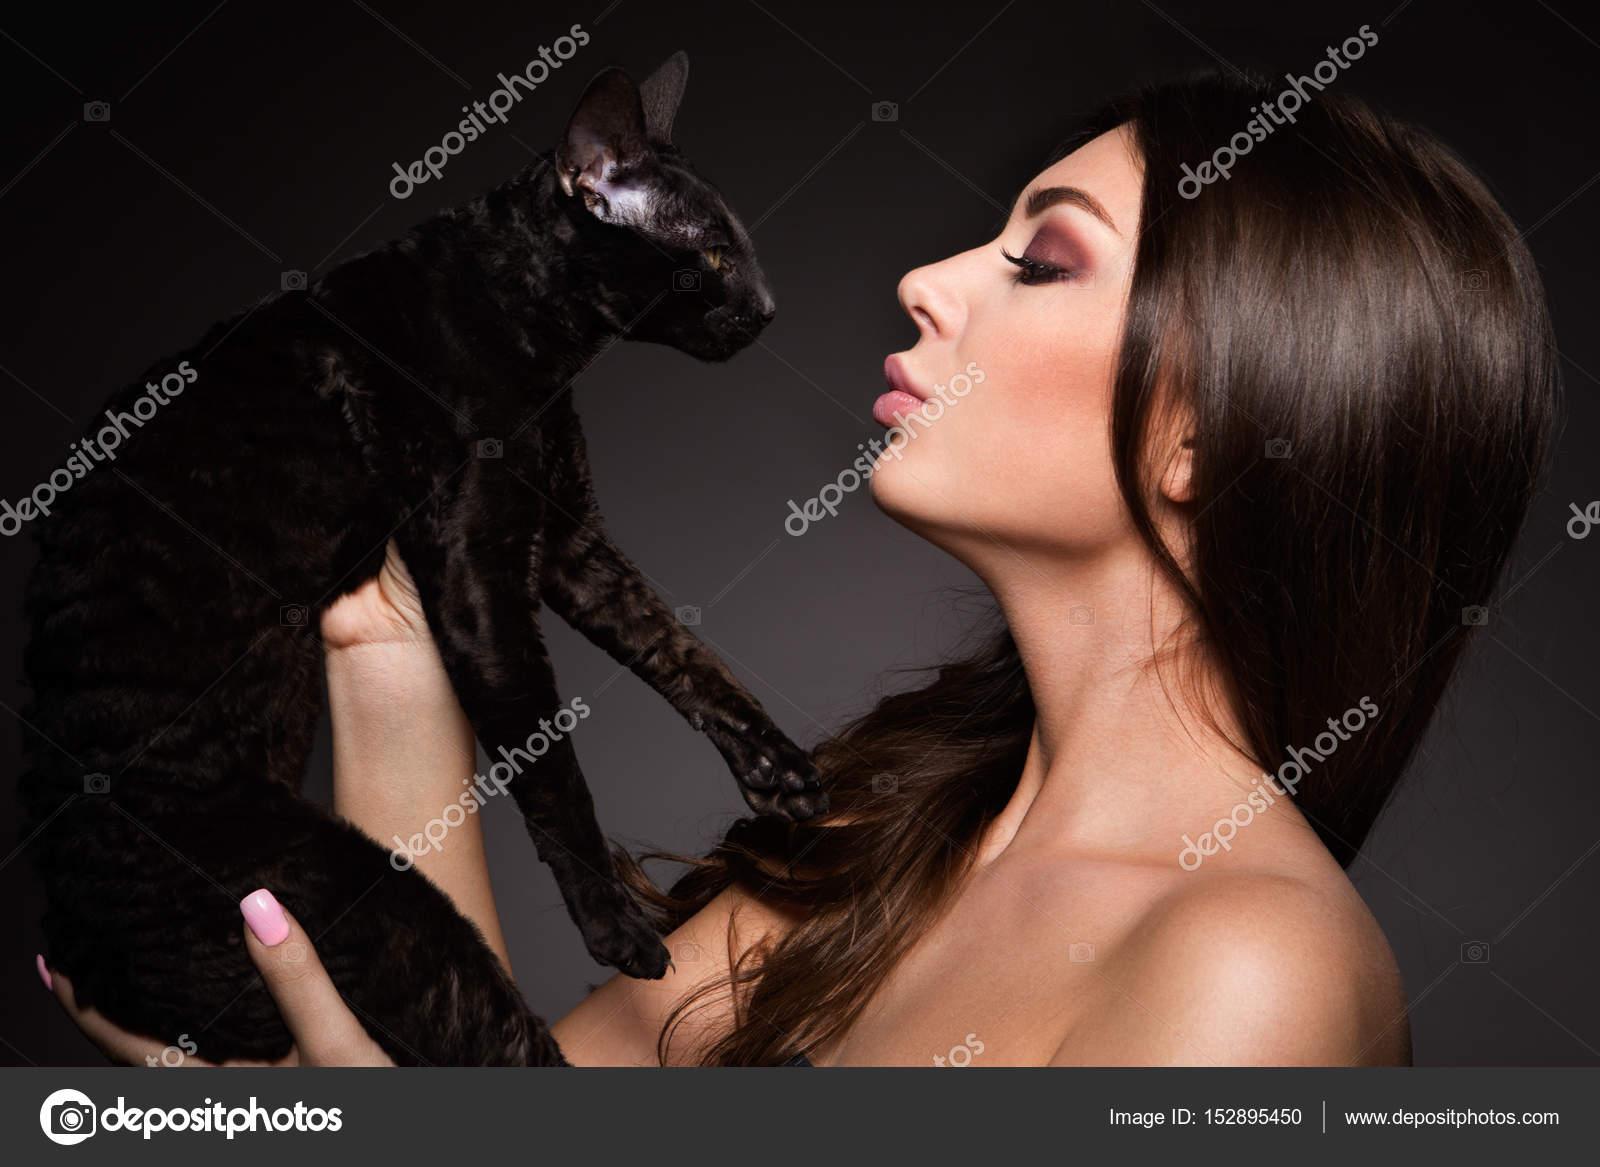 noir belle chatte humide fille chatte pic